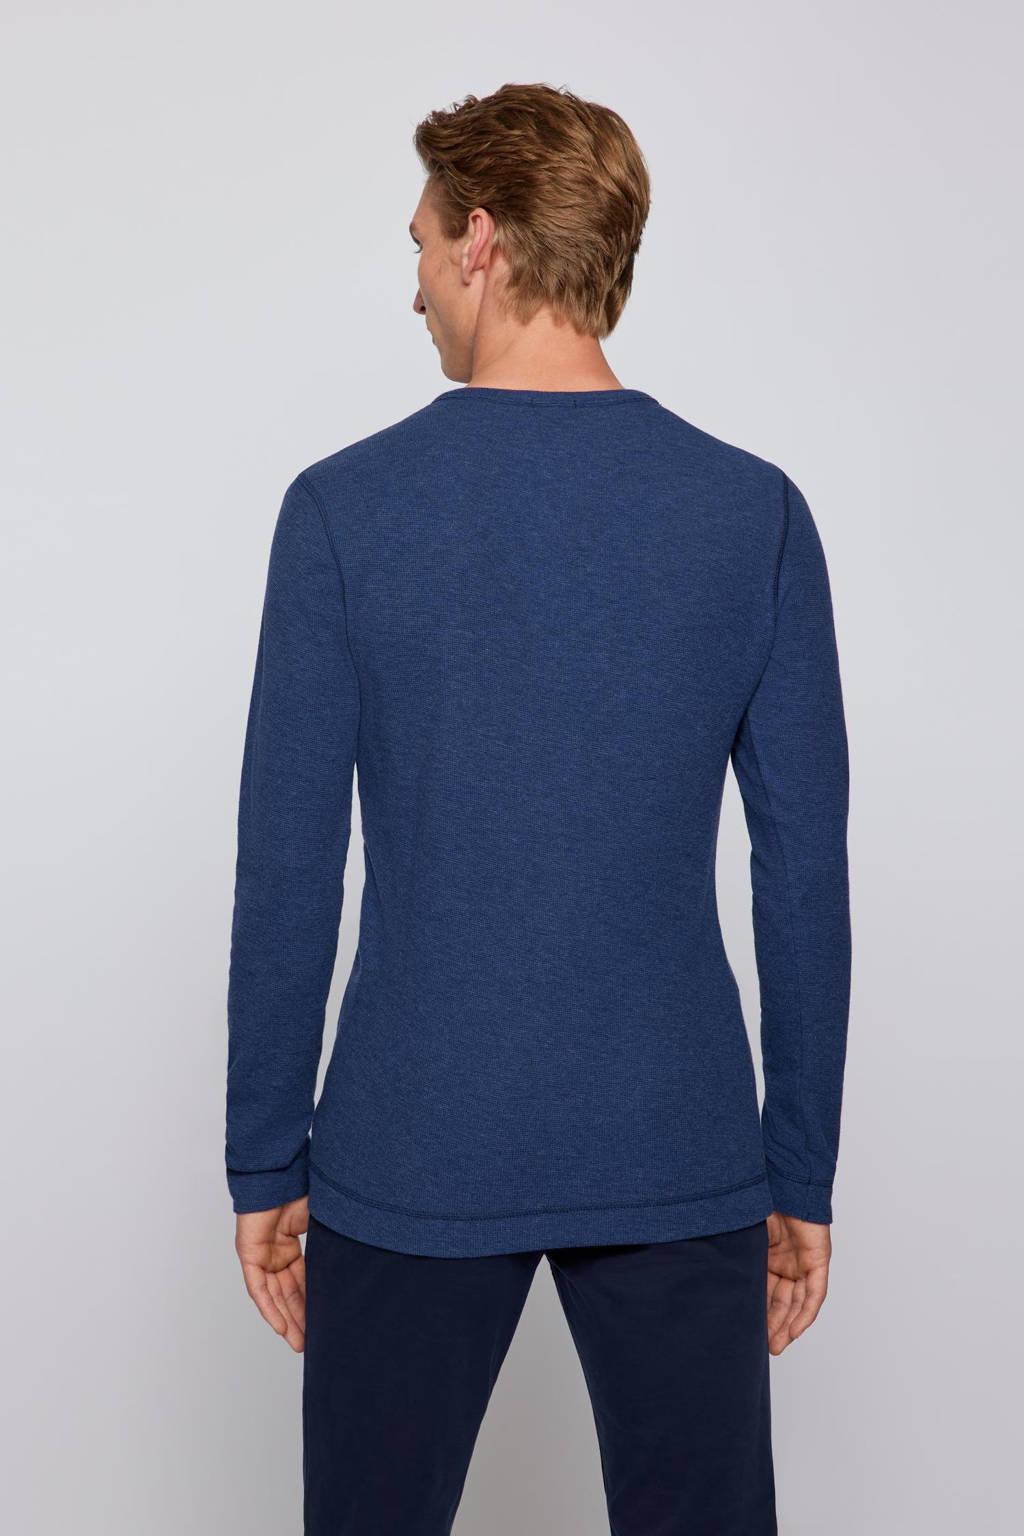 BOSS Casual fijngebreide longsleeve Trix donkerblauw, Donkerblauw